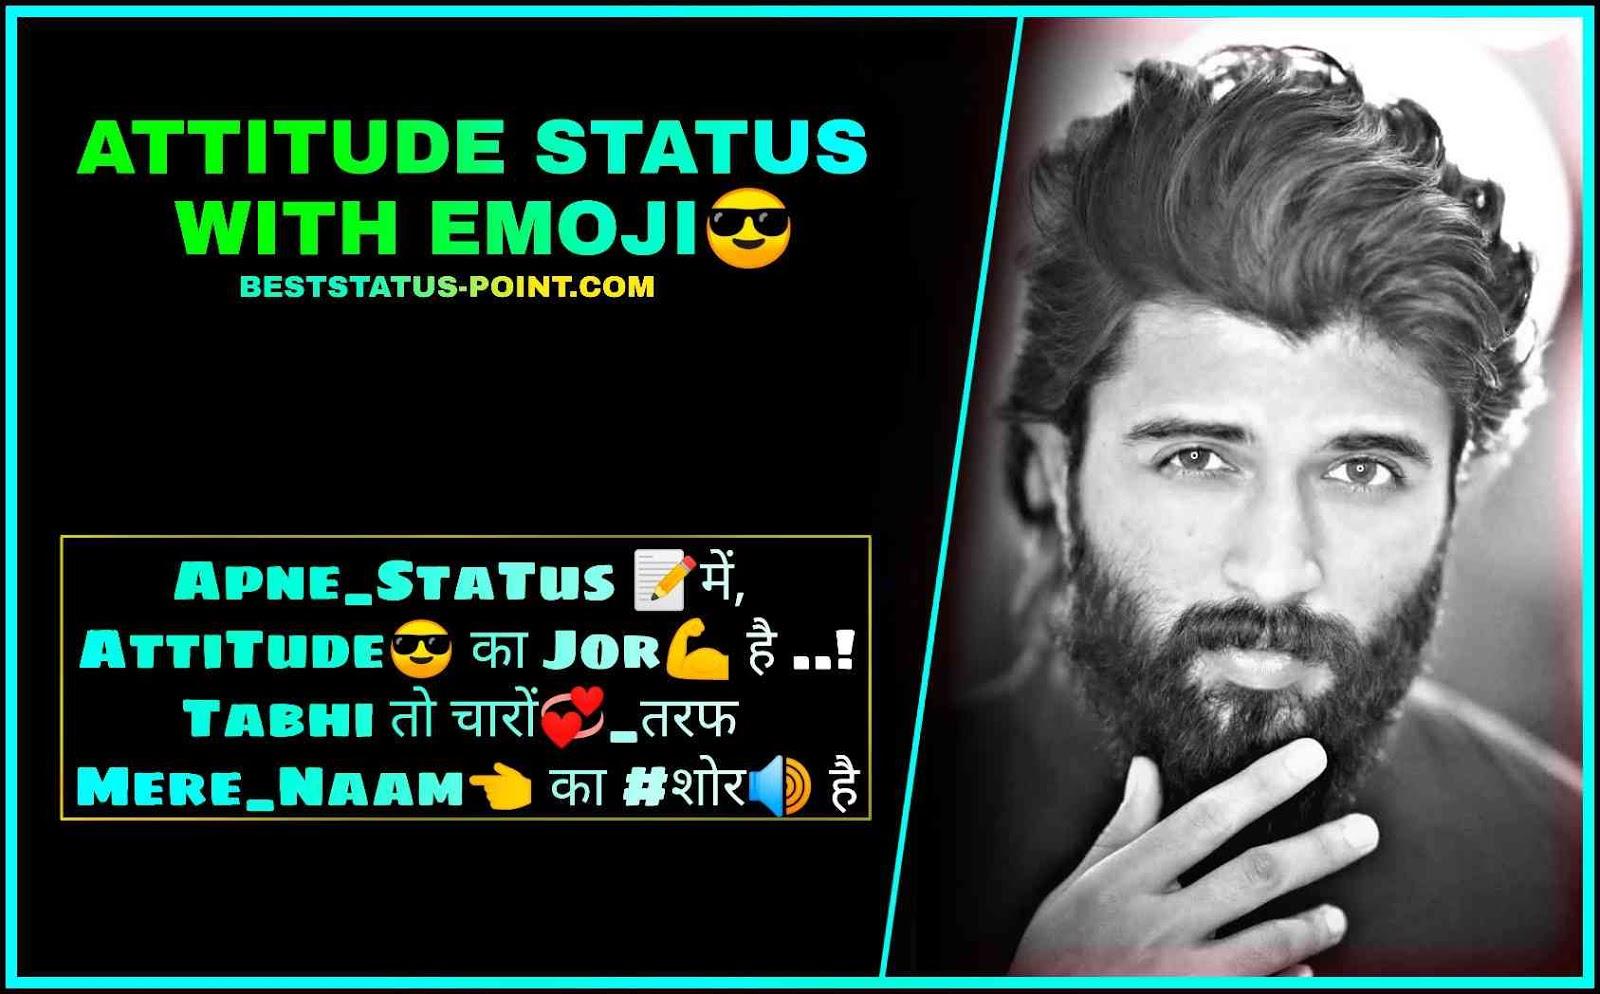 Attitude_Status_With_Emoji_in_Hindi